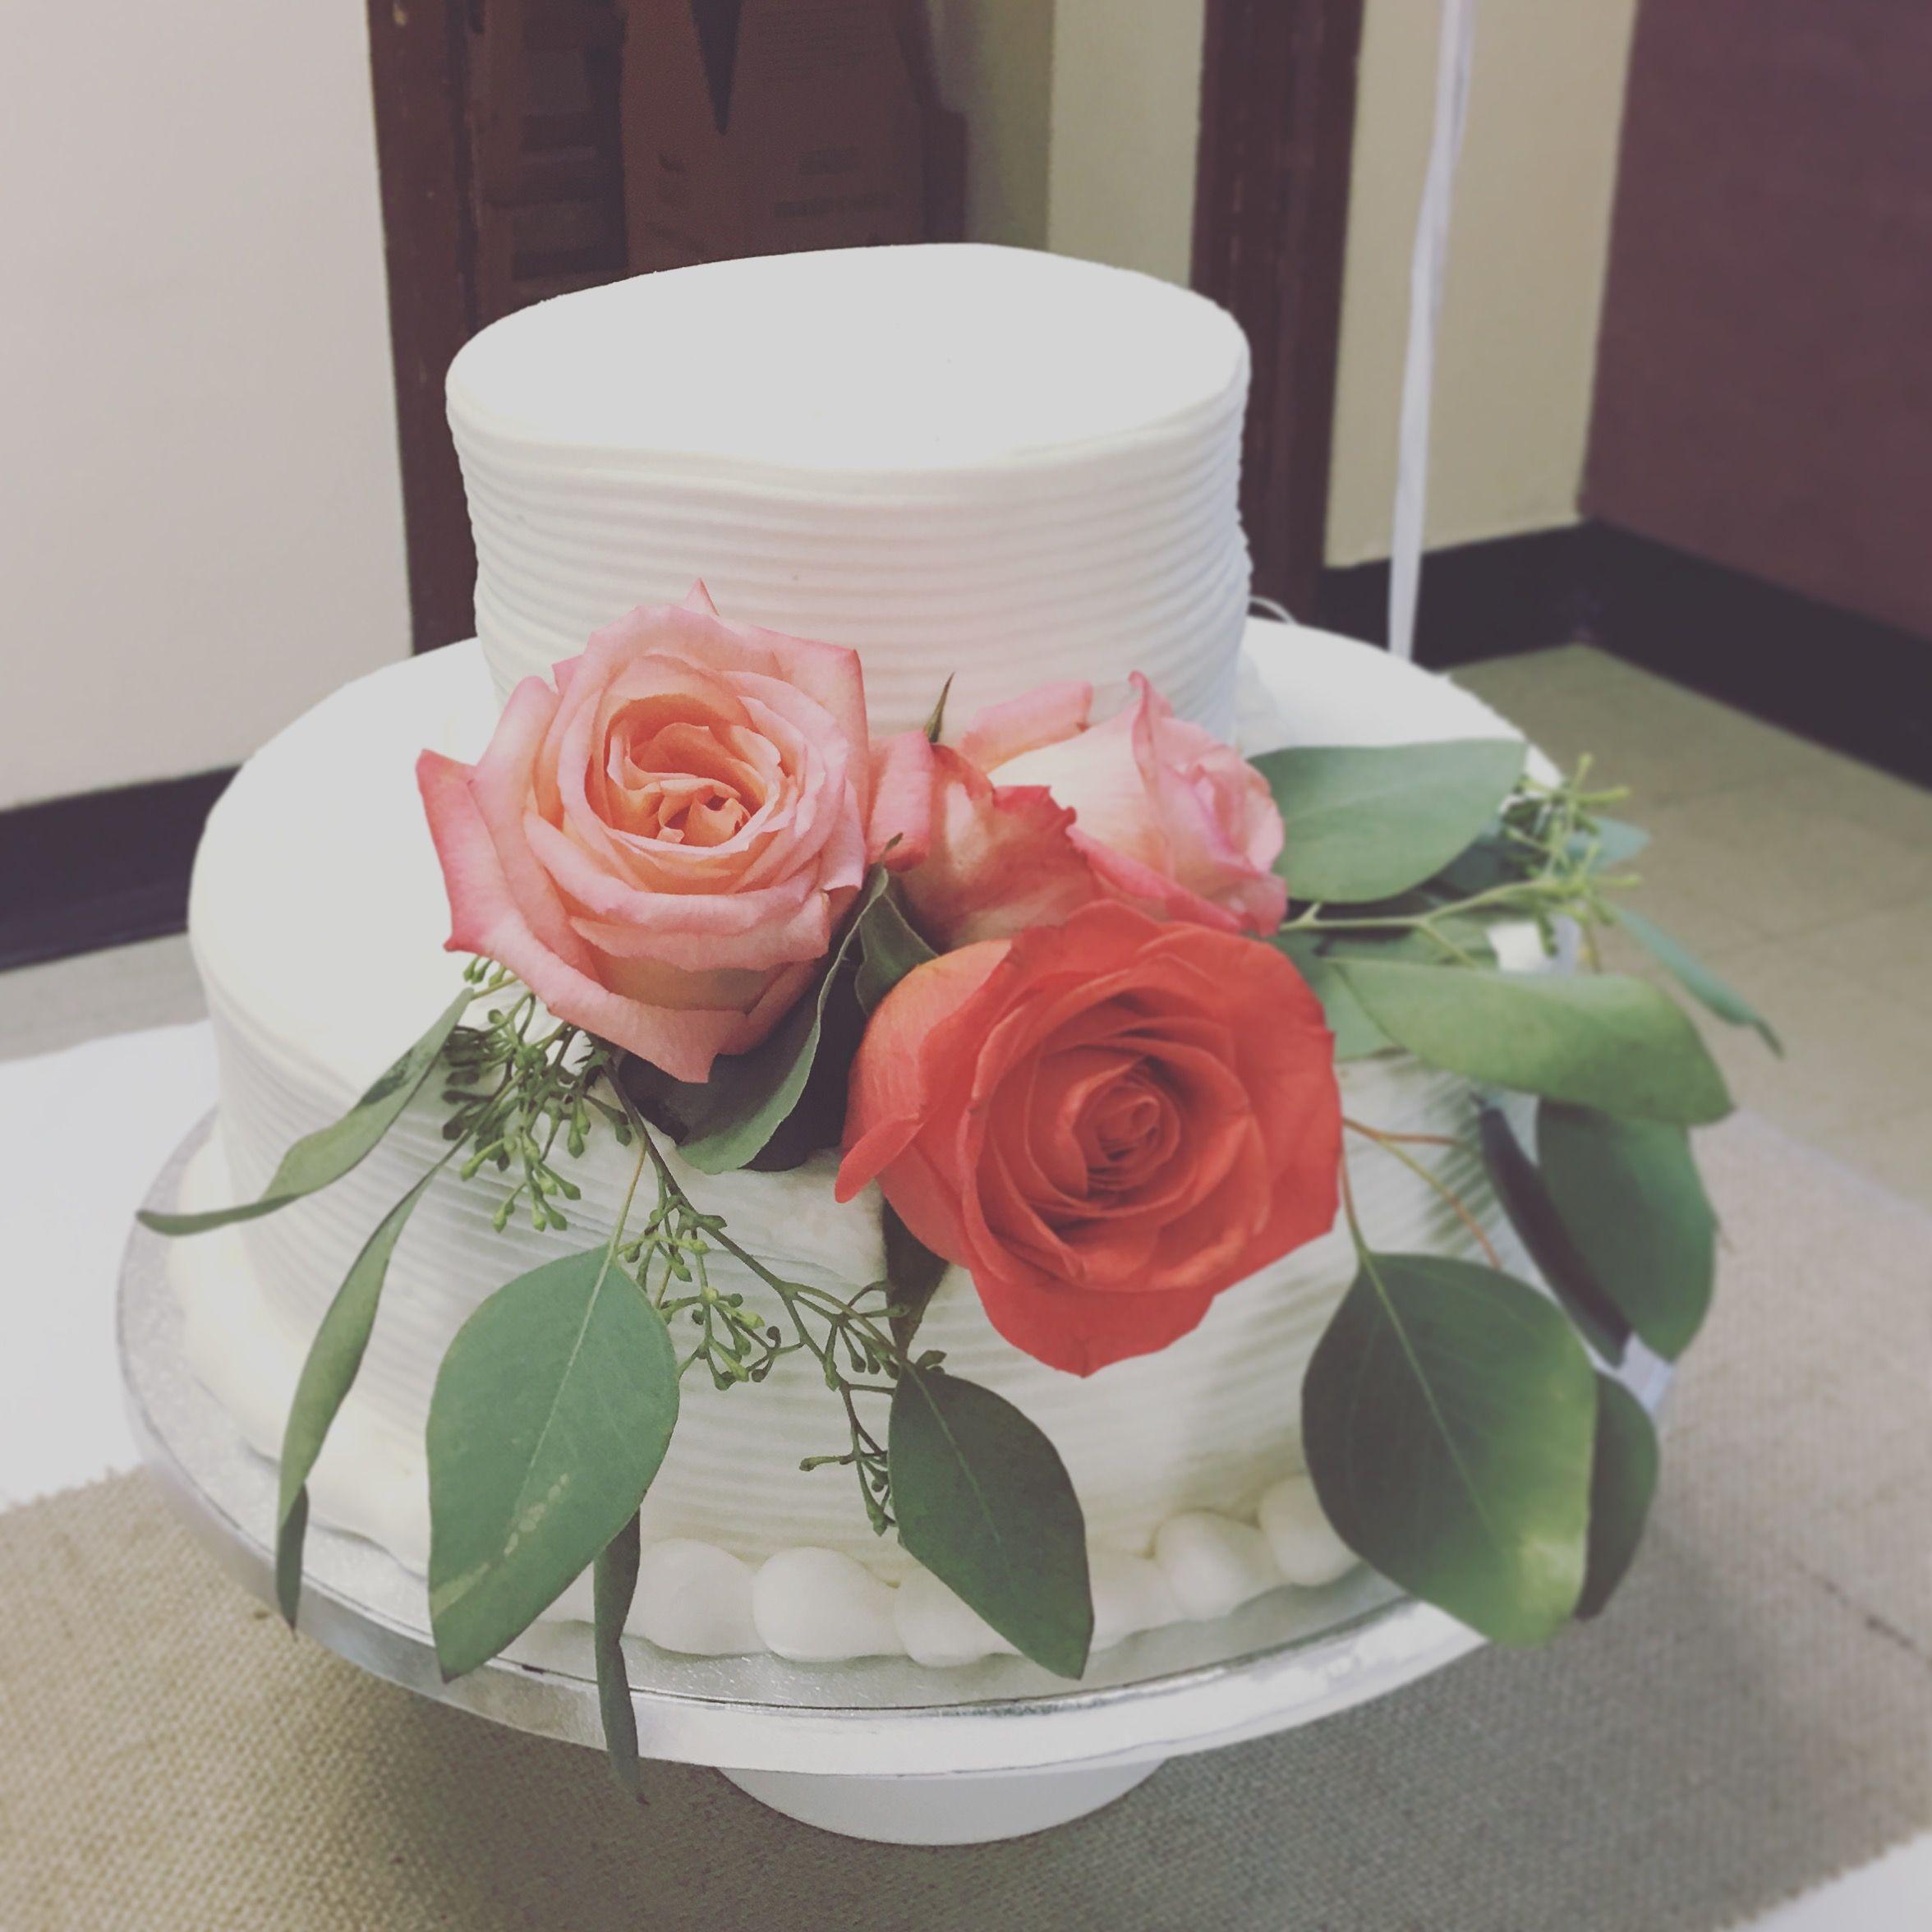 35th Wedding Anniversary Cake Coral 35th Wedding Anniversary Wedding Anniversary Cake Anniversary Cake